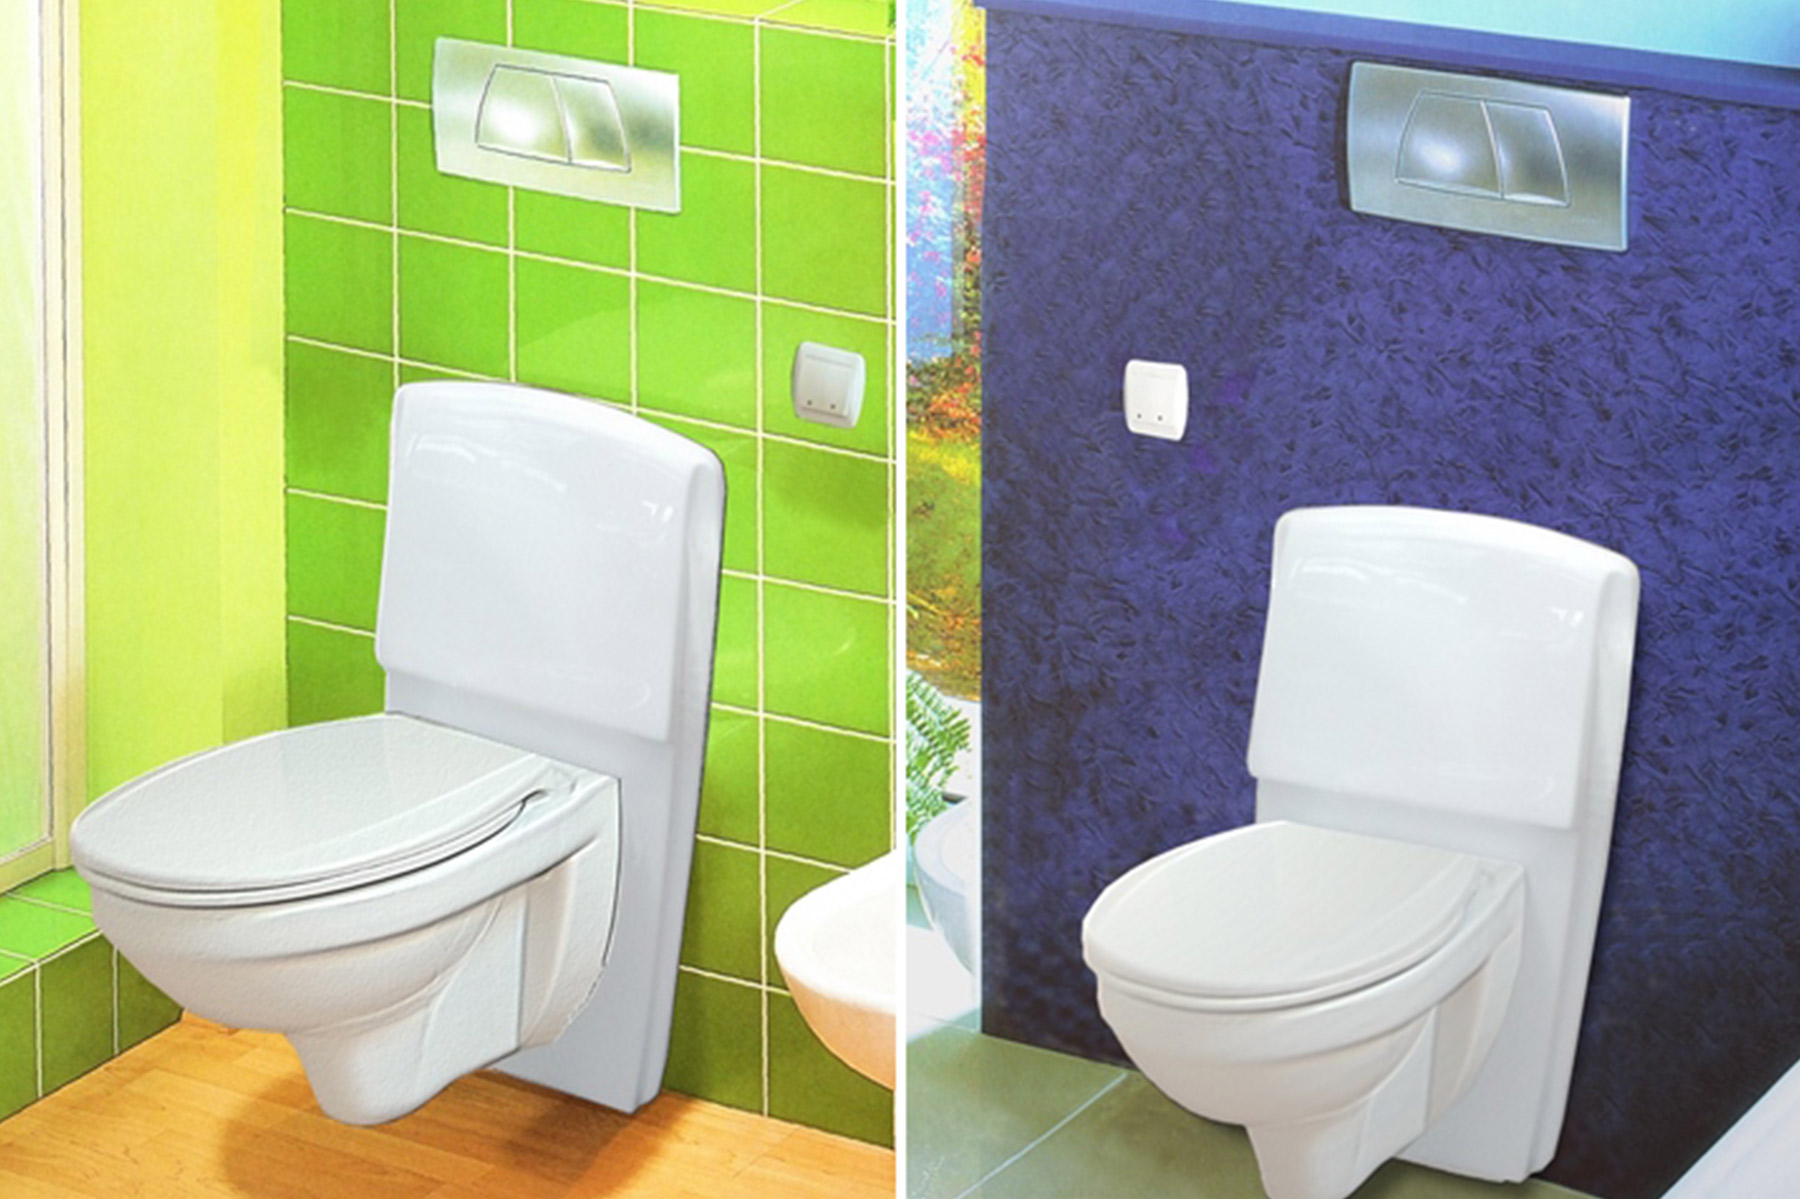 lift toilette forall gl projects hilfe f r menschen. Black Bedroom Furniture Sets. Home Design Ideas